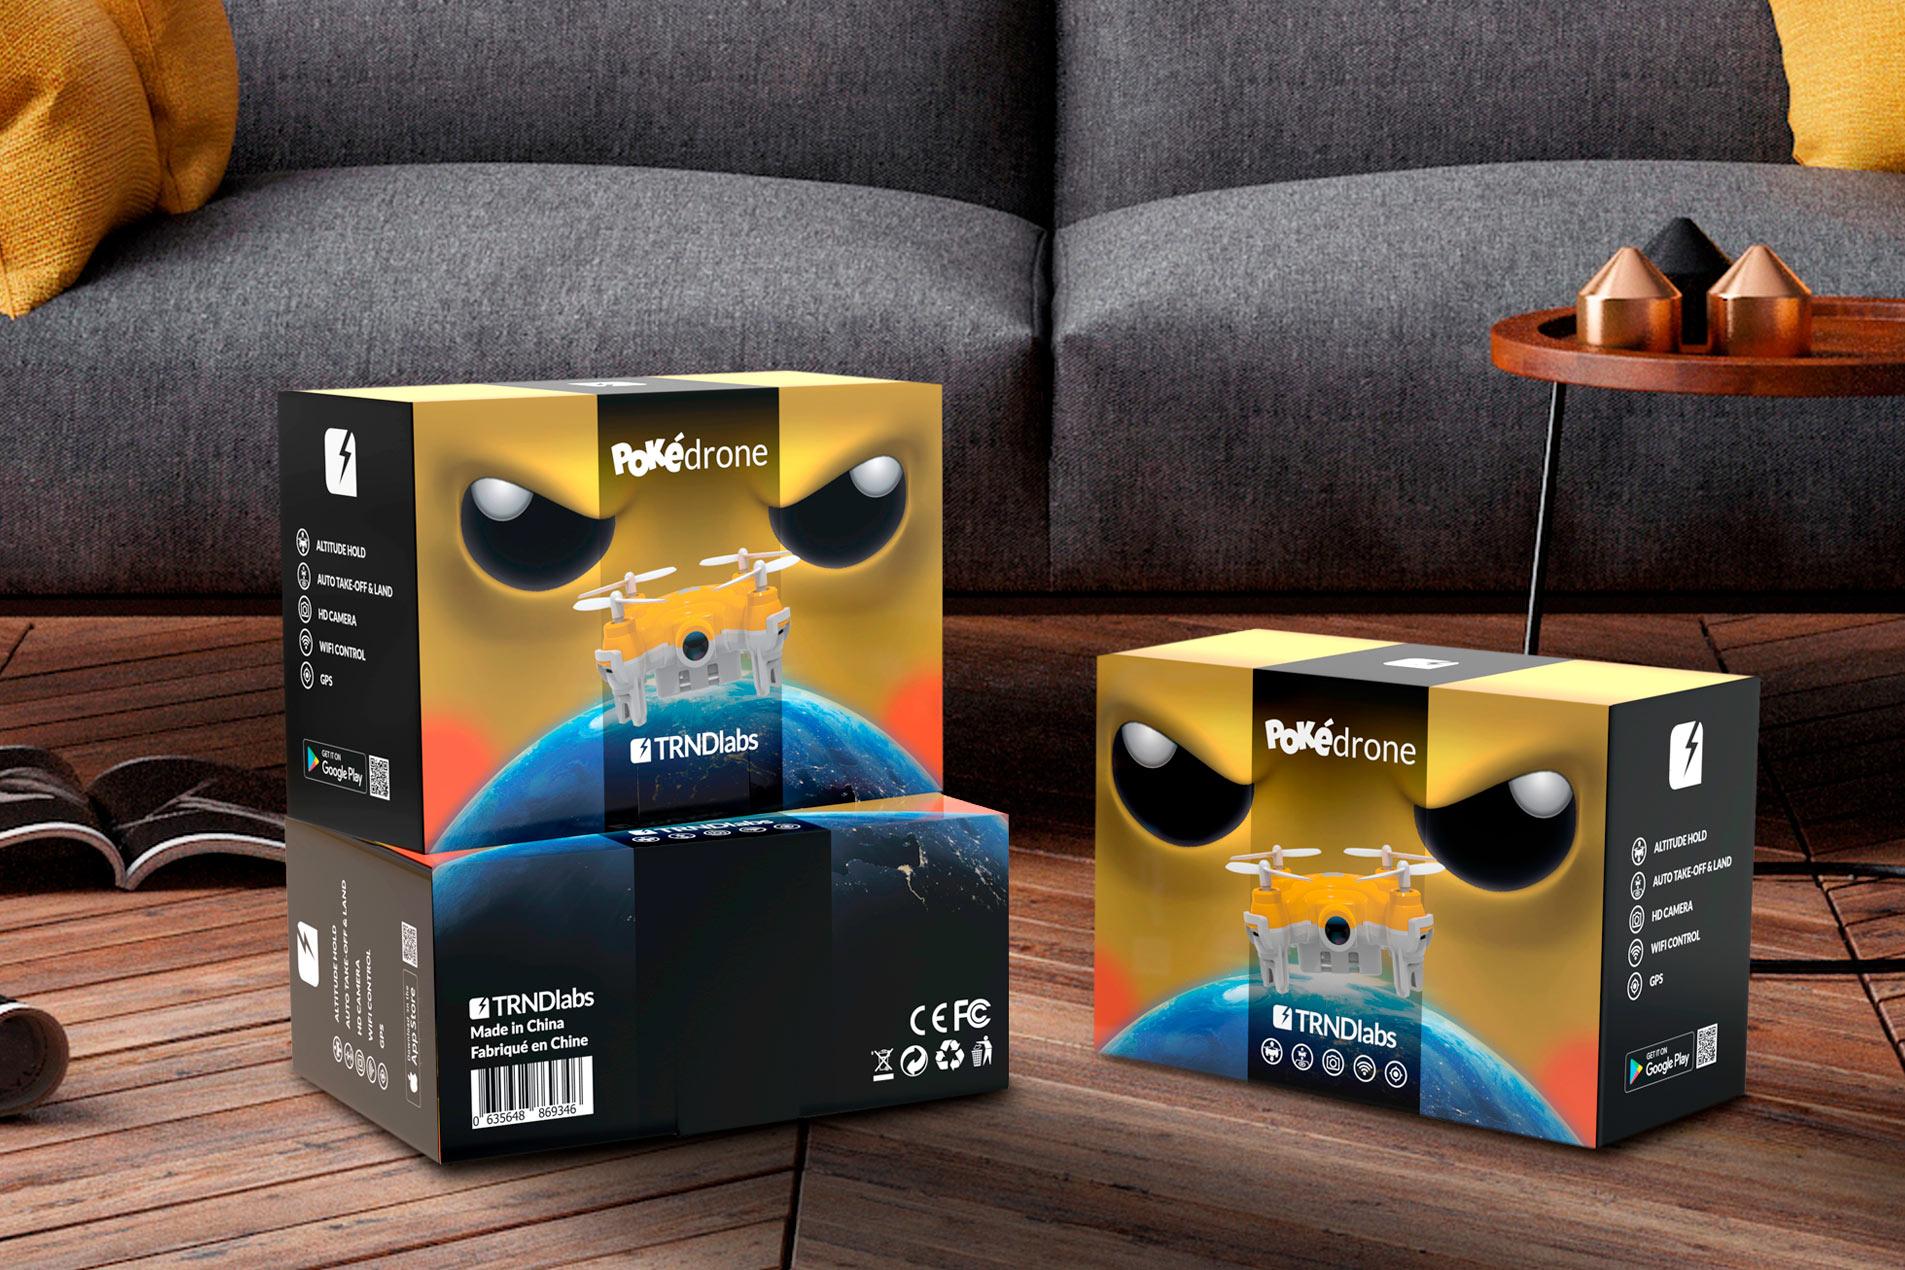 TRNDlabs Pokédrone verpakking